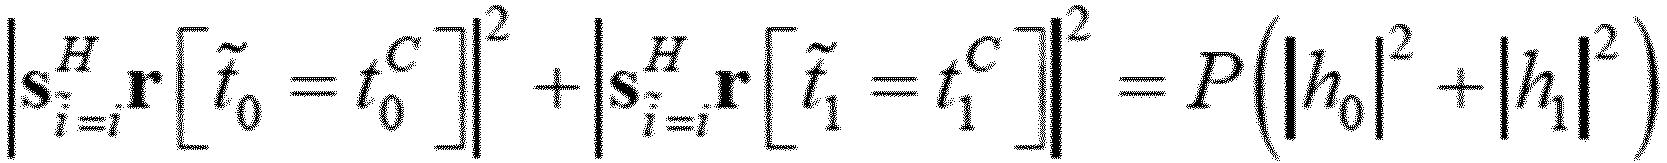 Figure PCTKR2016008367-appb-I000078